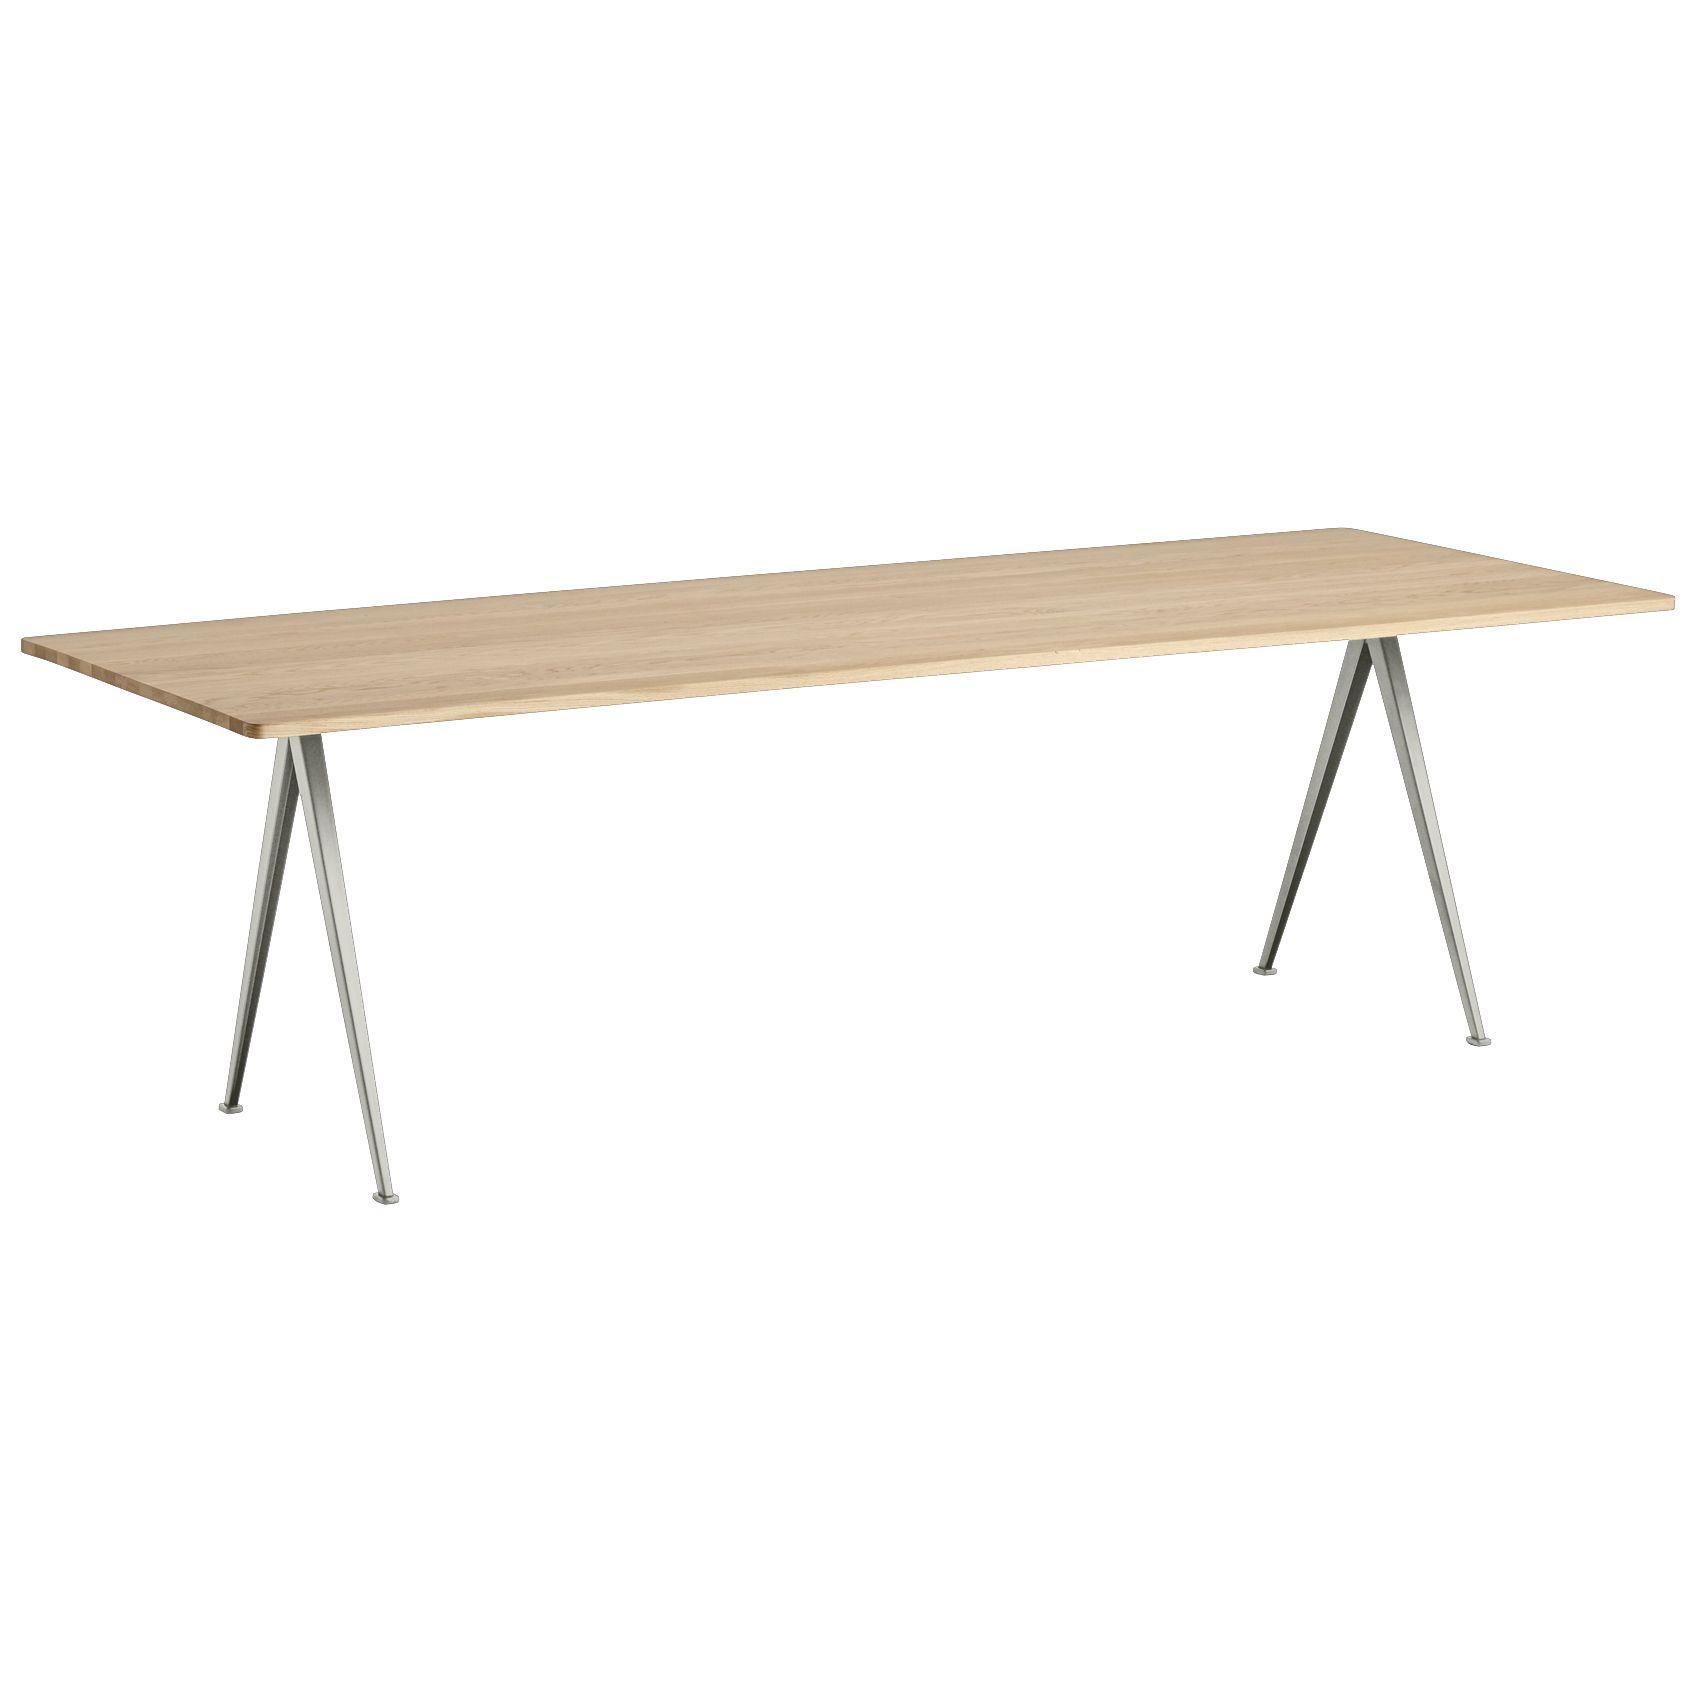 Hay Pyramid 02 tafel 250x85 mat gelakt beige onderstel